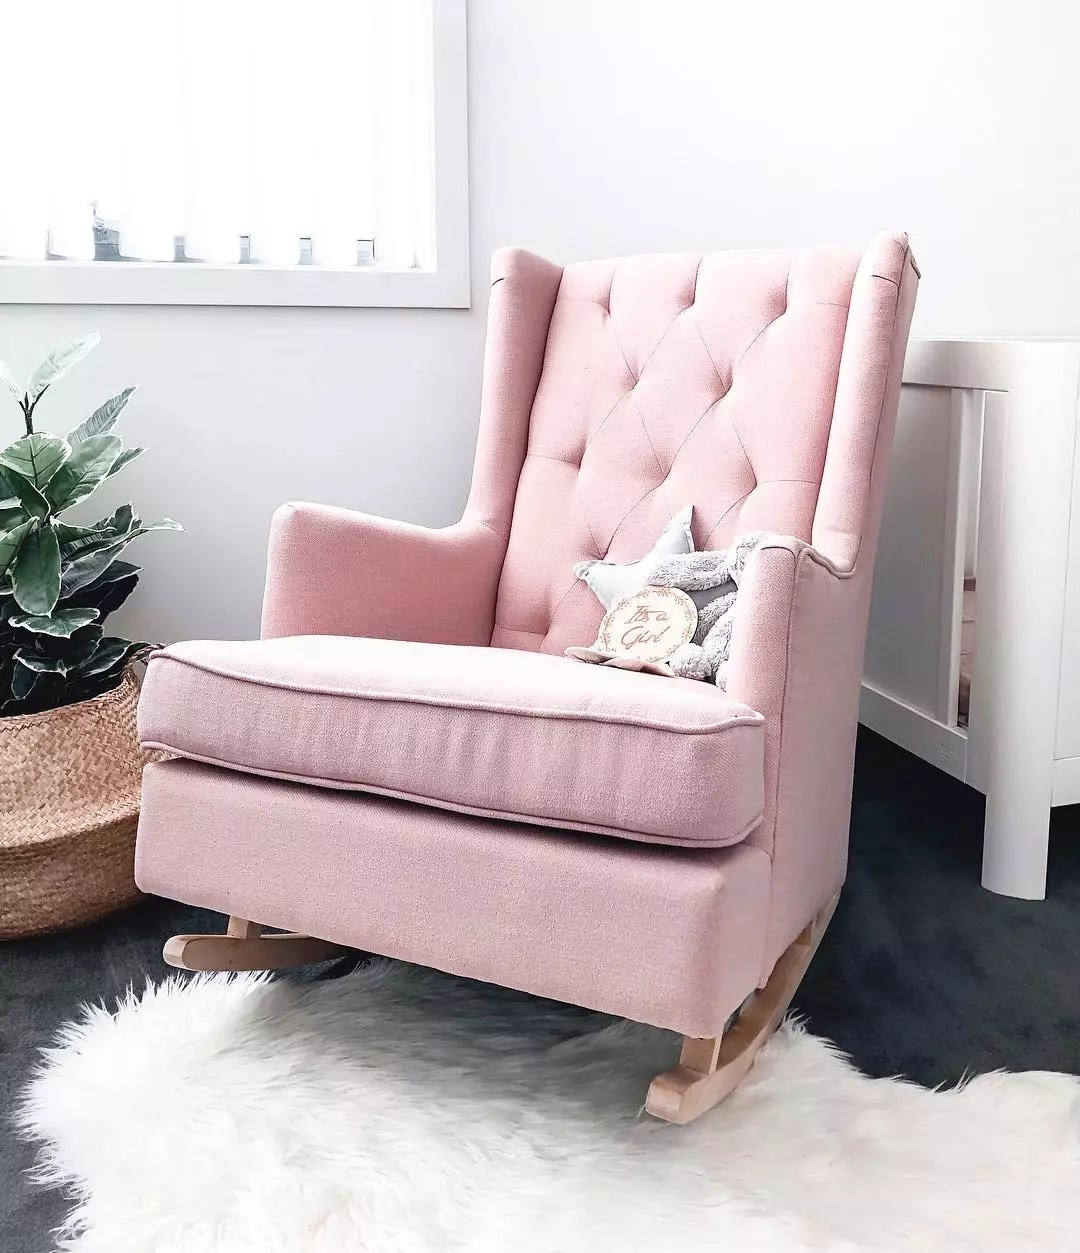 Pink rocking chair in nursery corner. Photo by Instagram user @mamaplusthree_